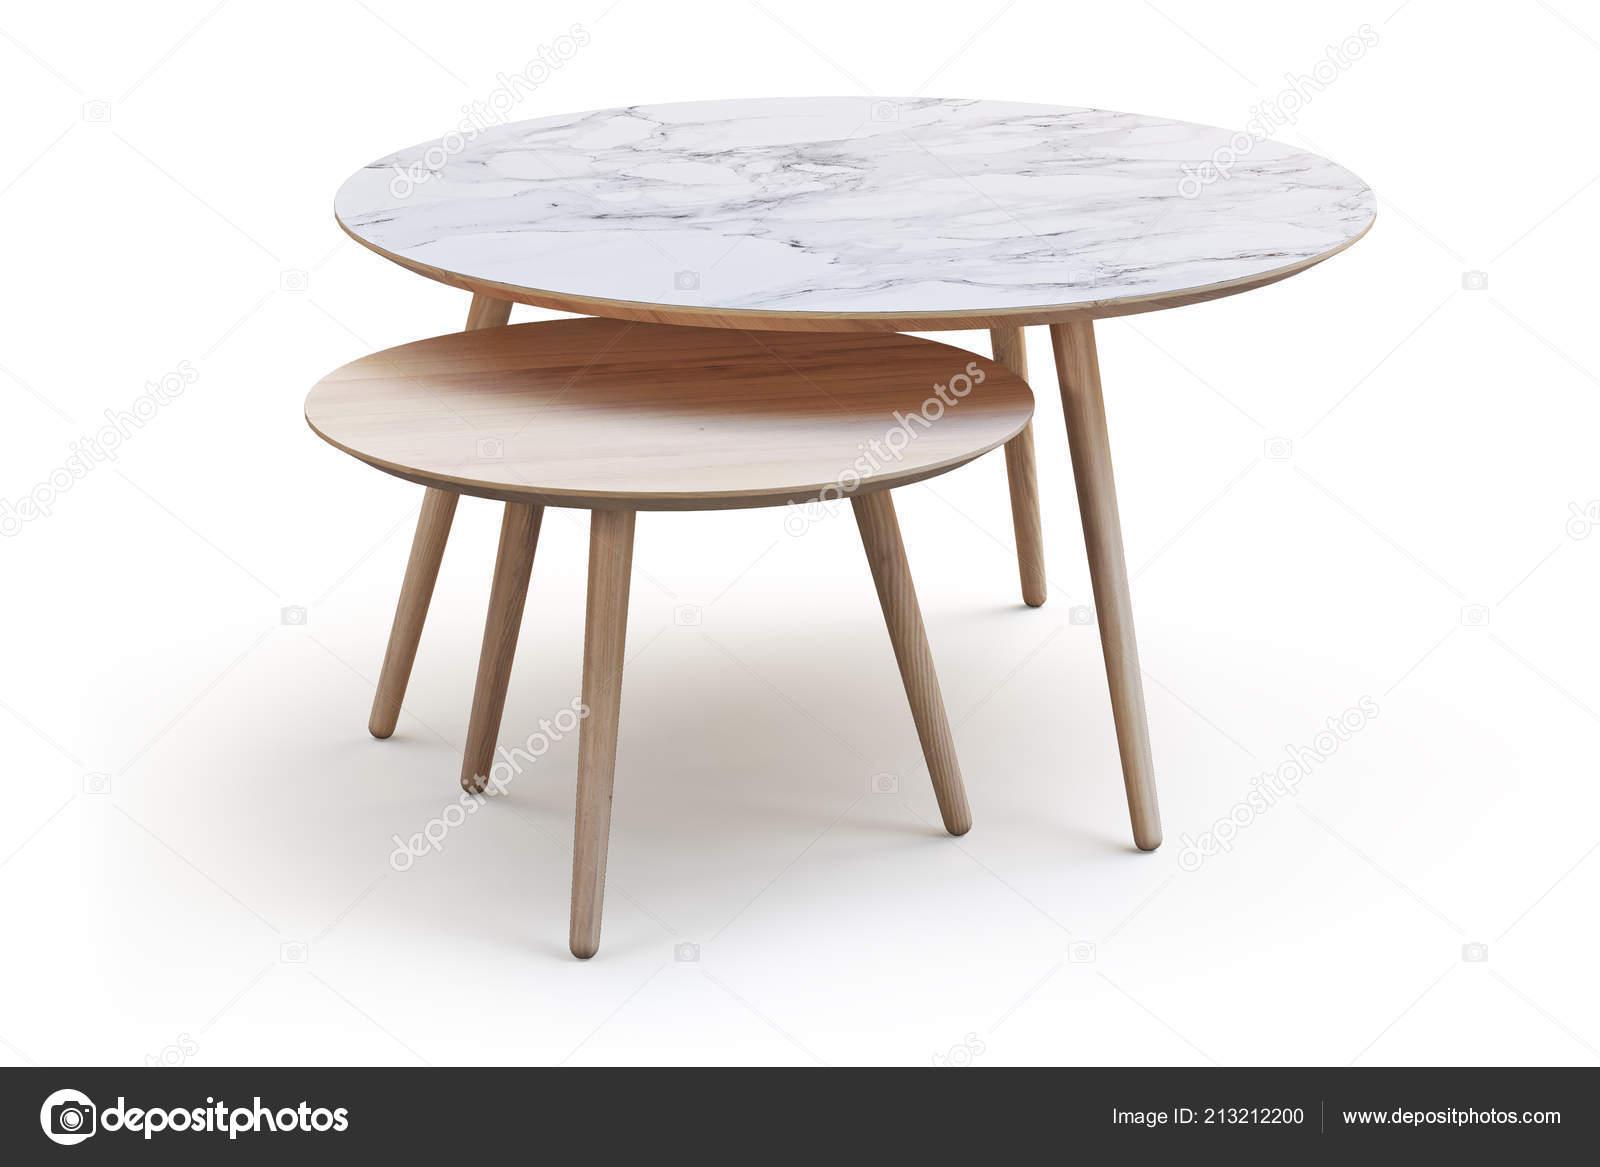 Tavolini Da Salotto Rotondi Moderni.Tavolini Salotto Rotondi Bianchi Moderni Gambe Sottili Marmo